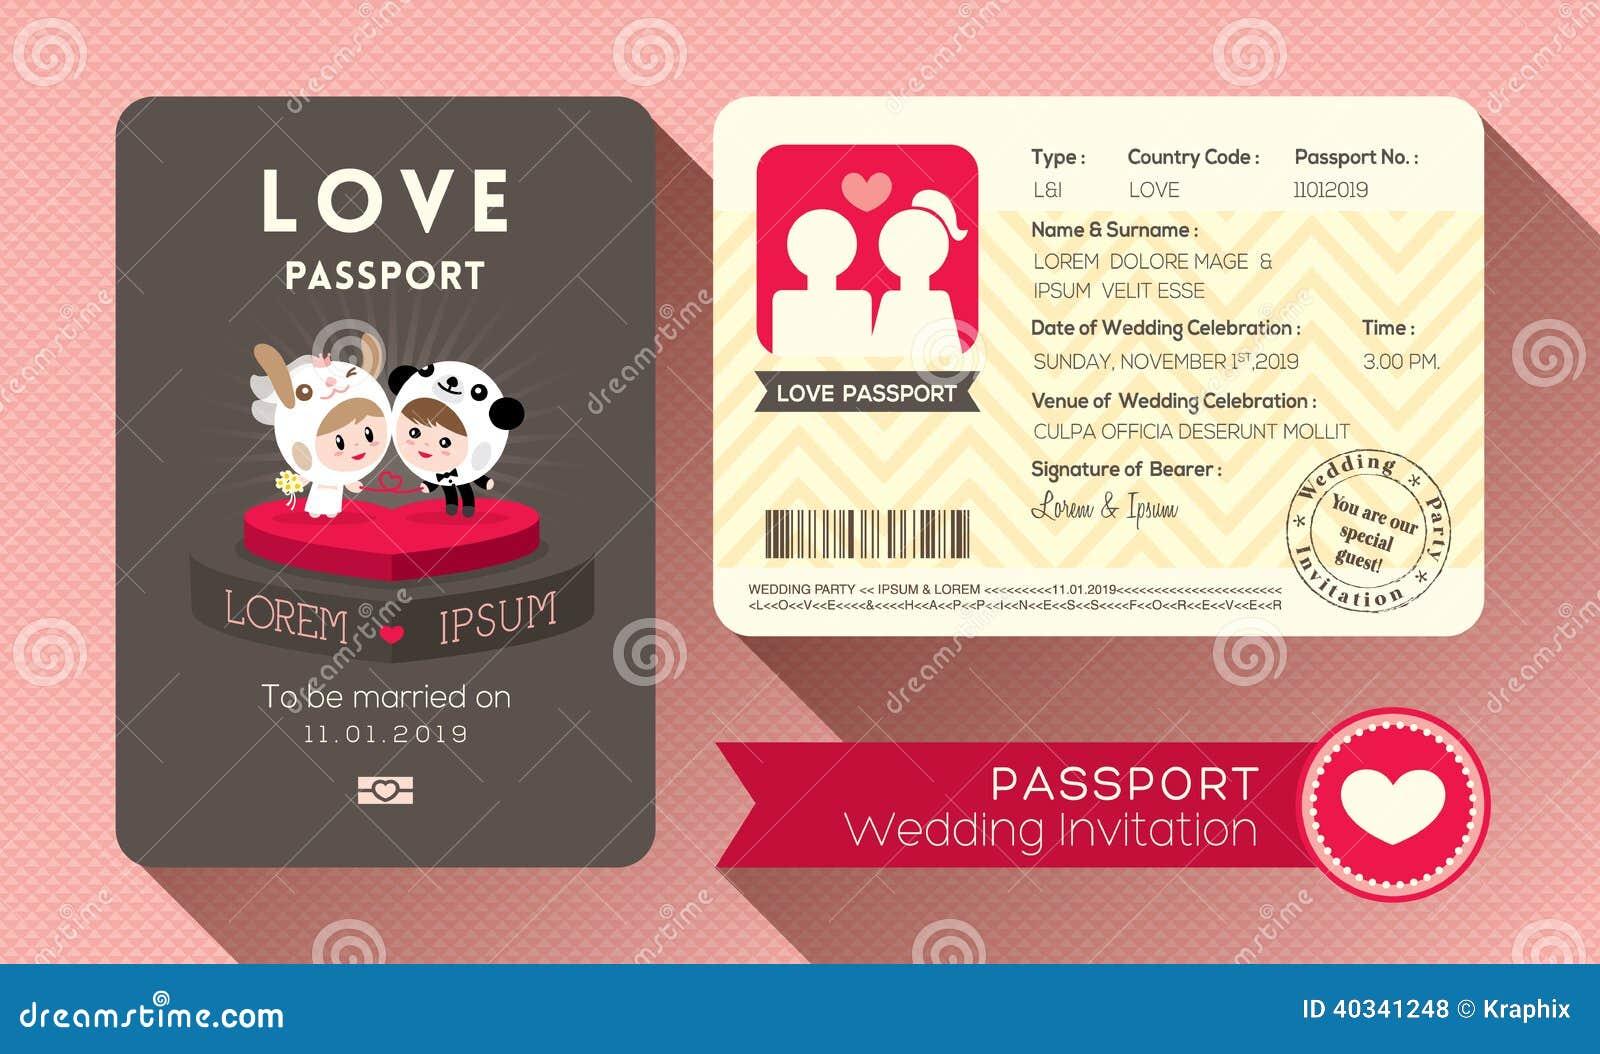 Passport Invitations Wedding as awesome invitations ideas